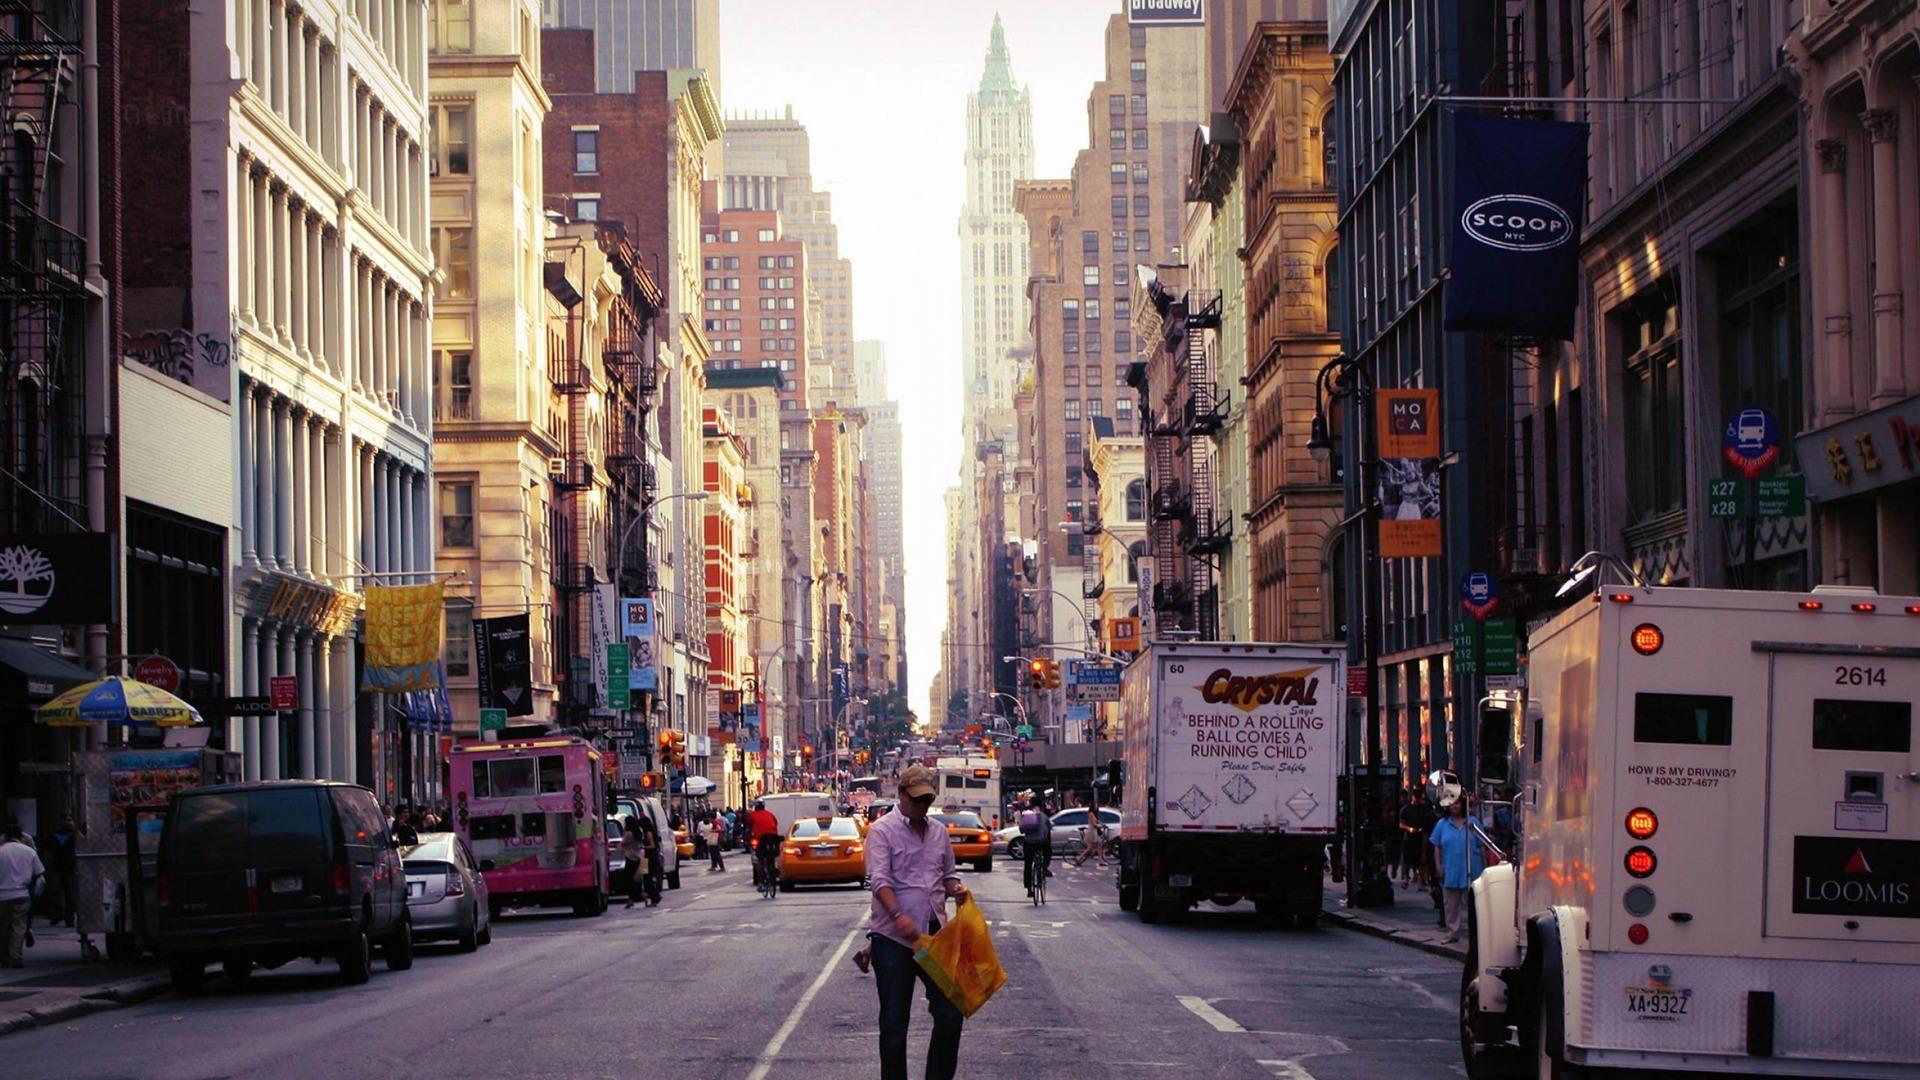 New York City Street Wallpaper - WallpaperSafari City Street Photography